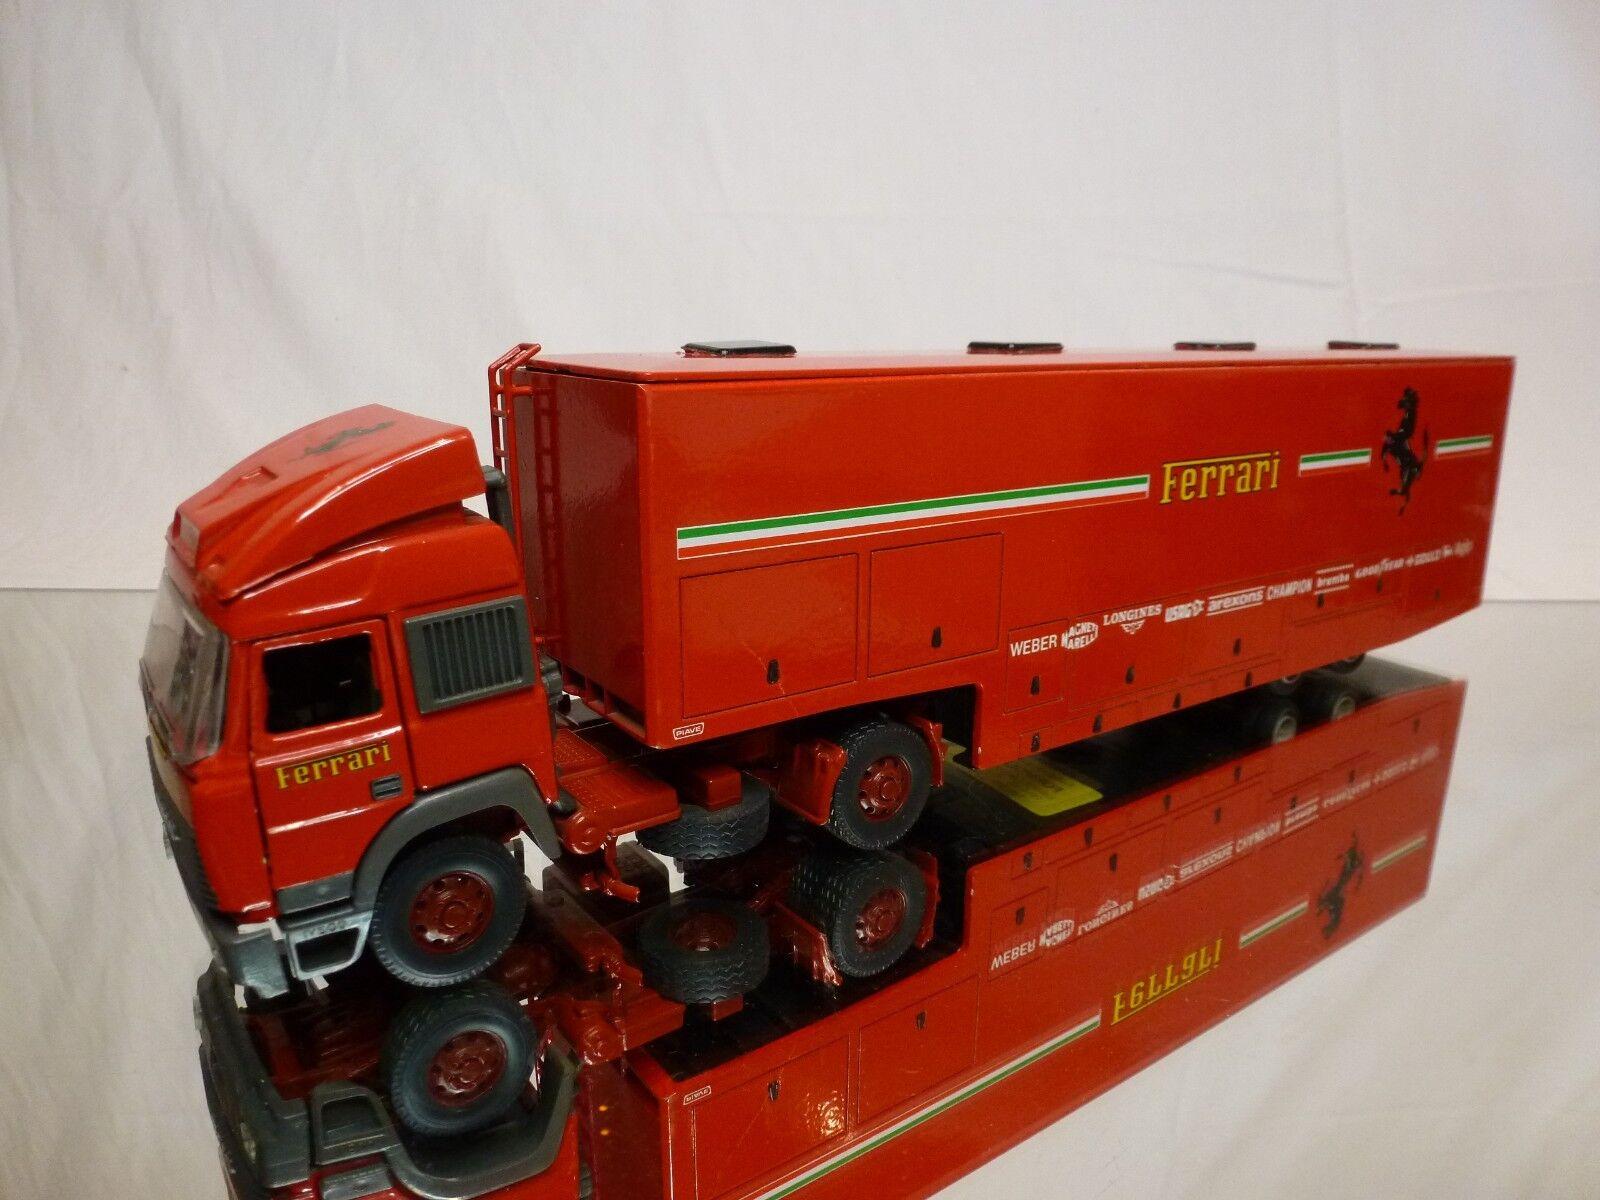 OLD CARS IVECO TURBOSTAR - CAR TRANSPORTER FERRARI F1 rosso 1 43 - GOOD CONDITION